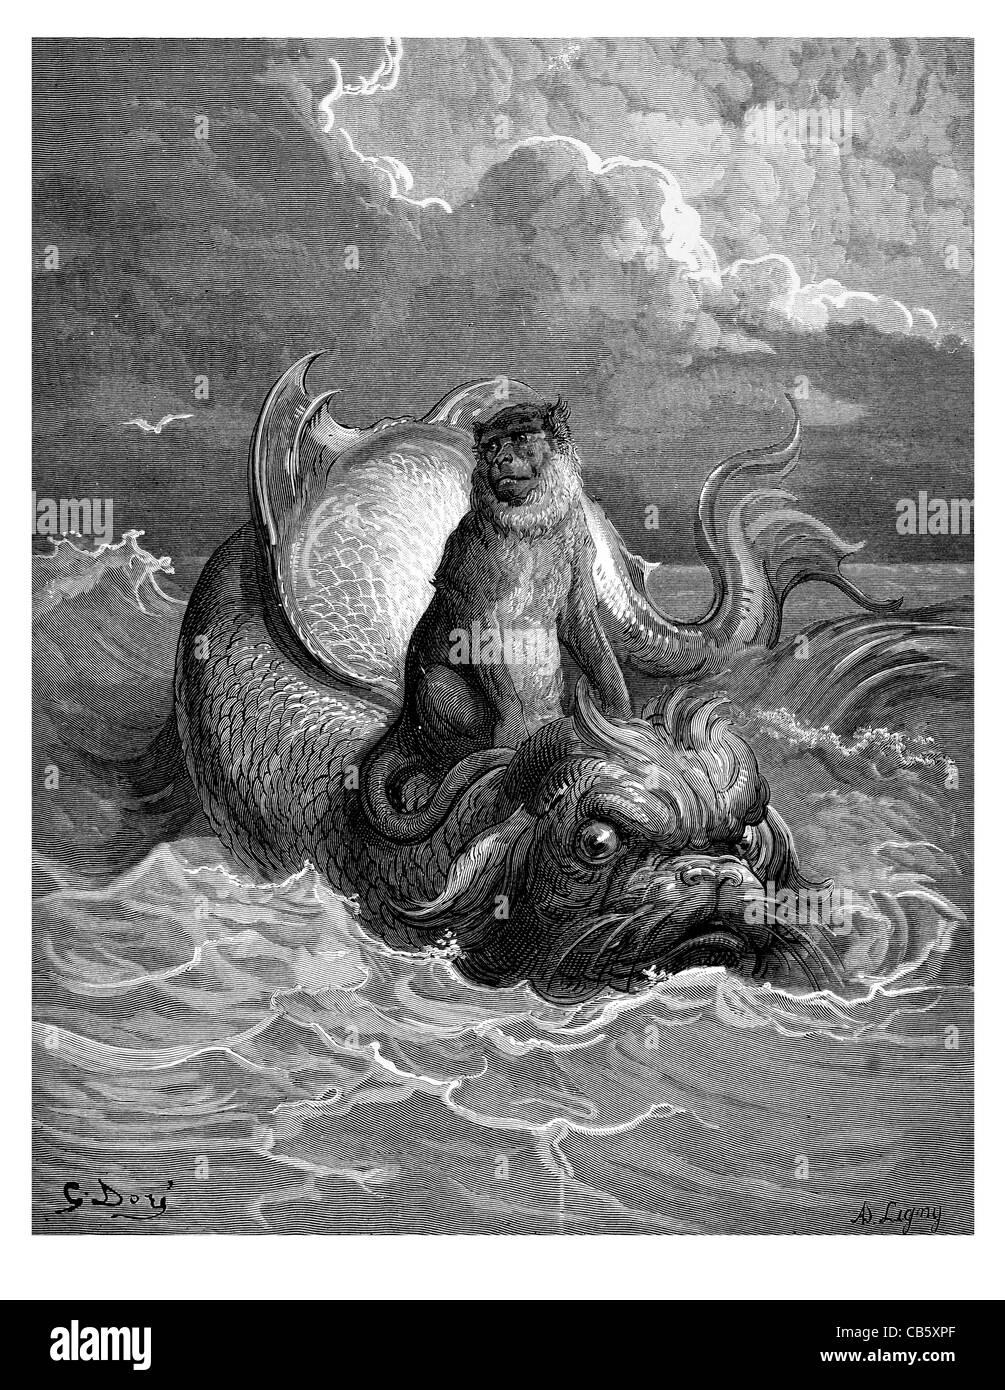 Fontaine Le Singe et le Dauphin The Monkey and the Dolphin riding waves ocean sea mythology mythical myth beast - Stock Image